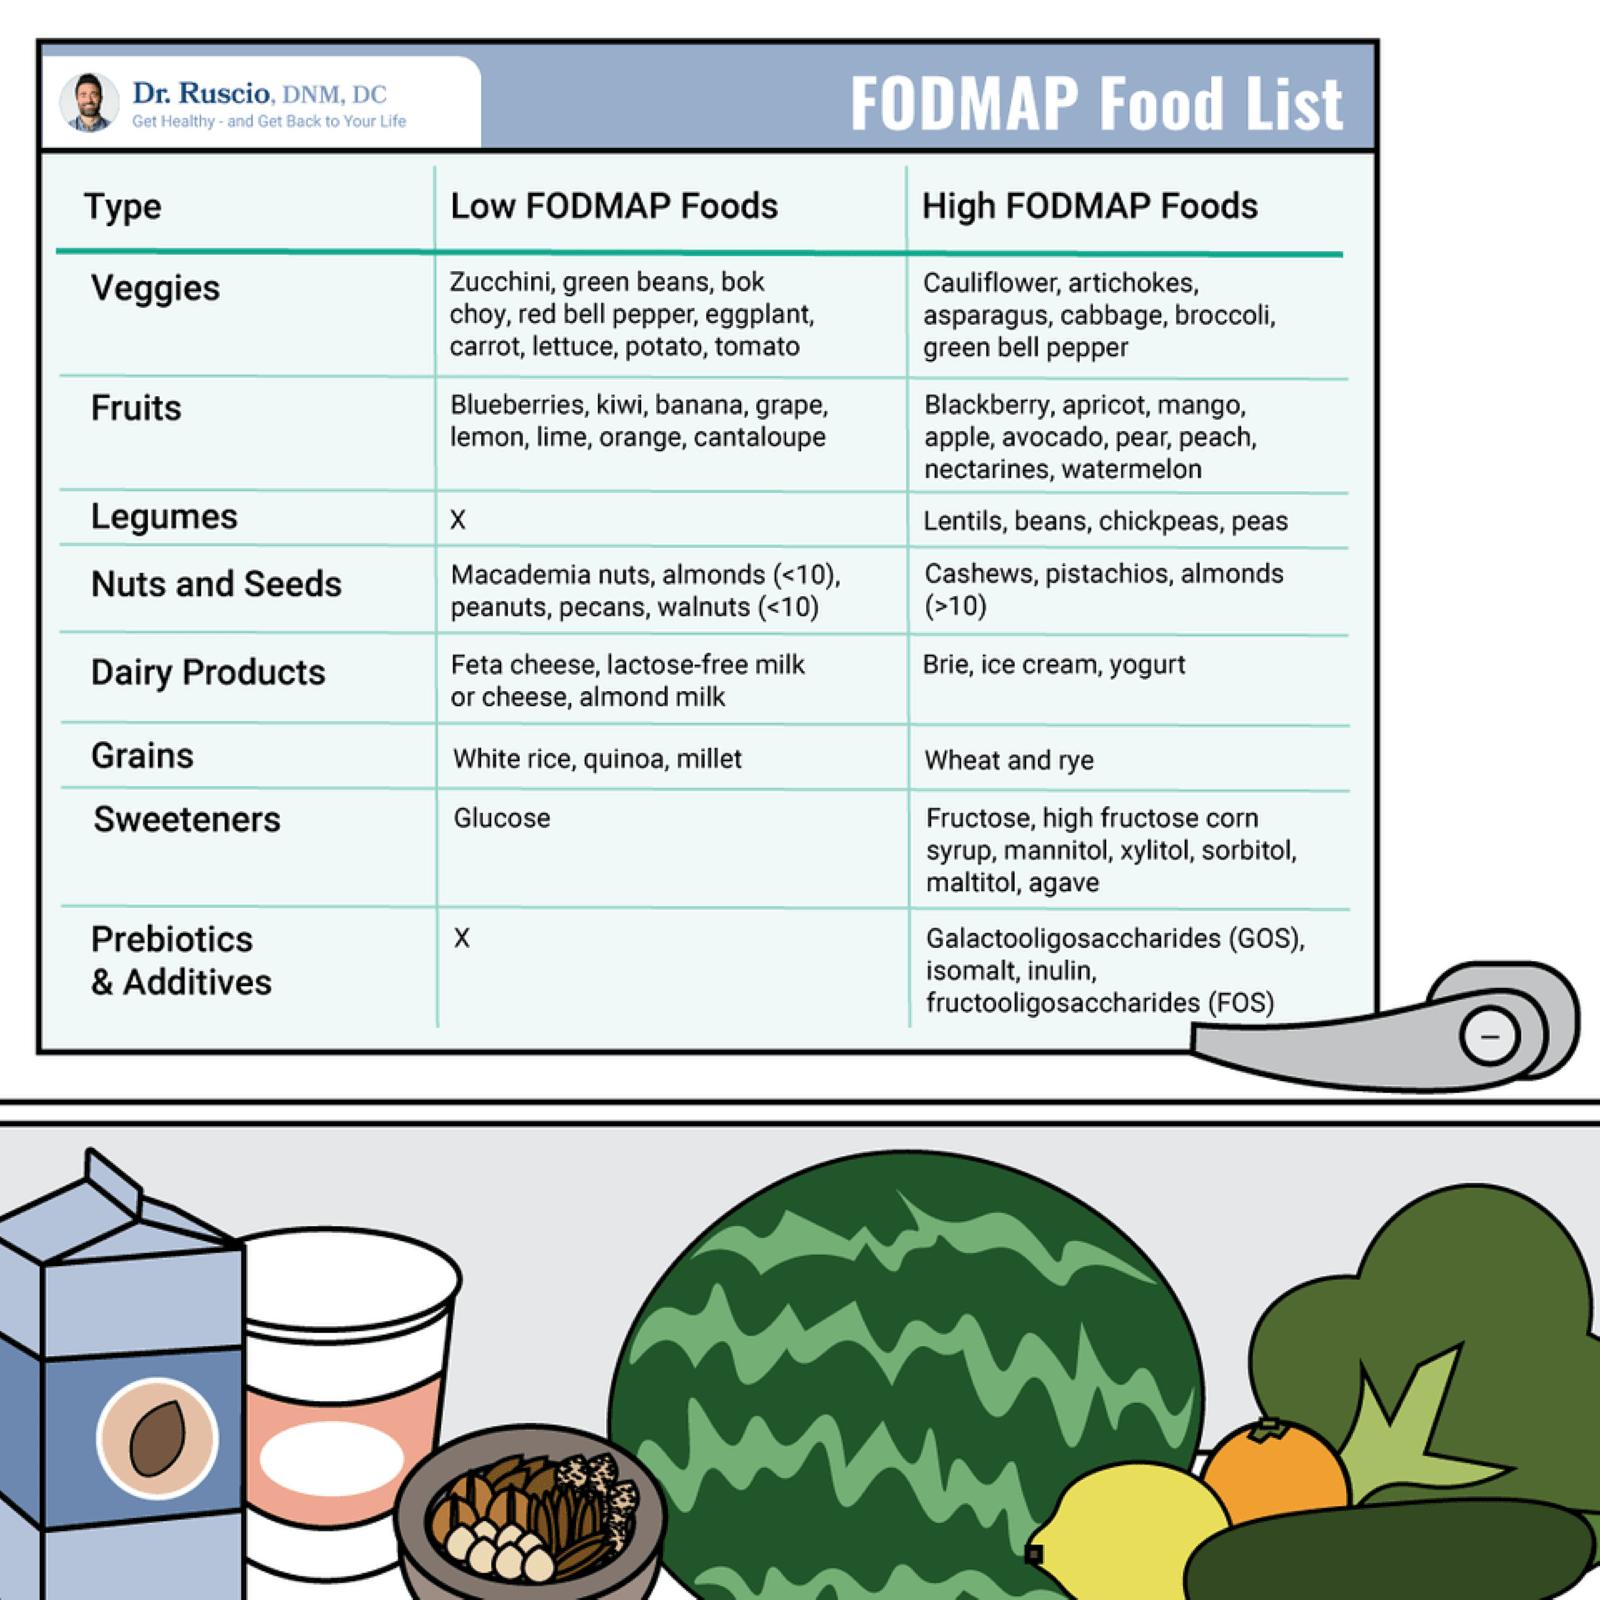 leaky gut diet: FODMAP food list infographic